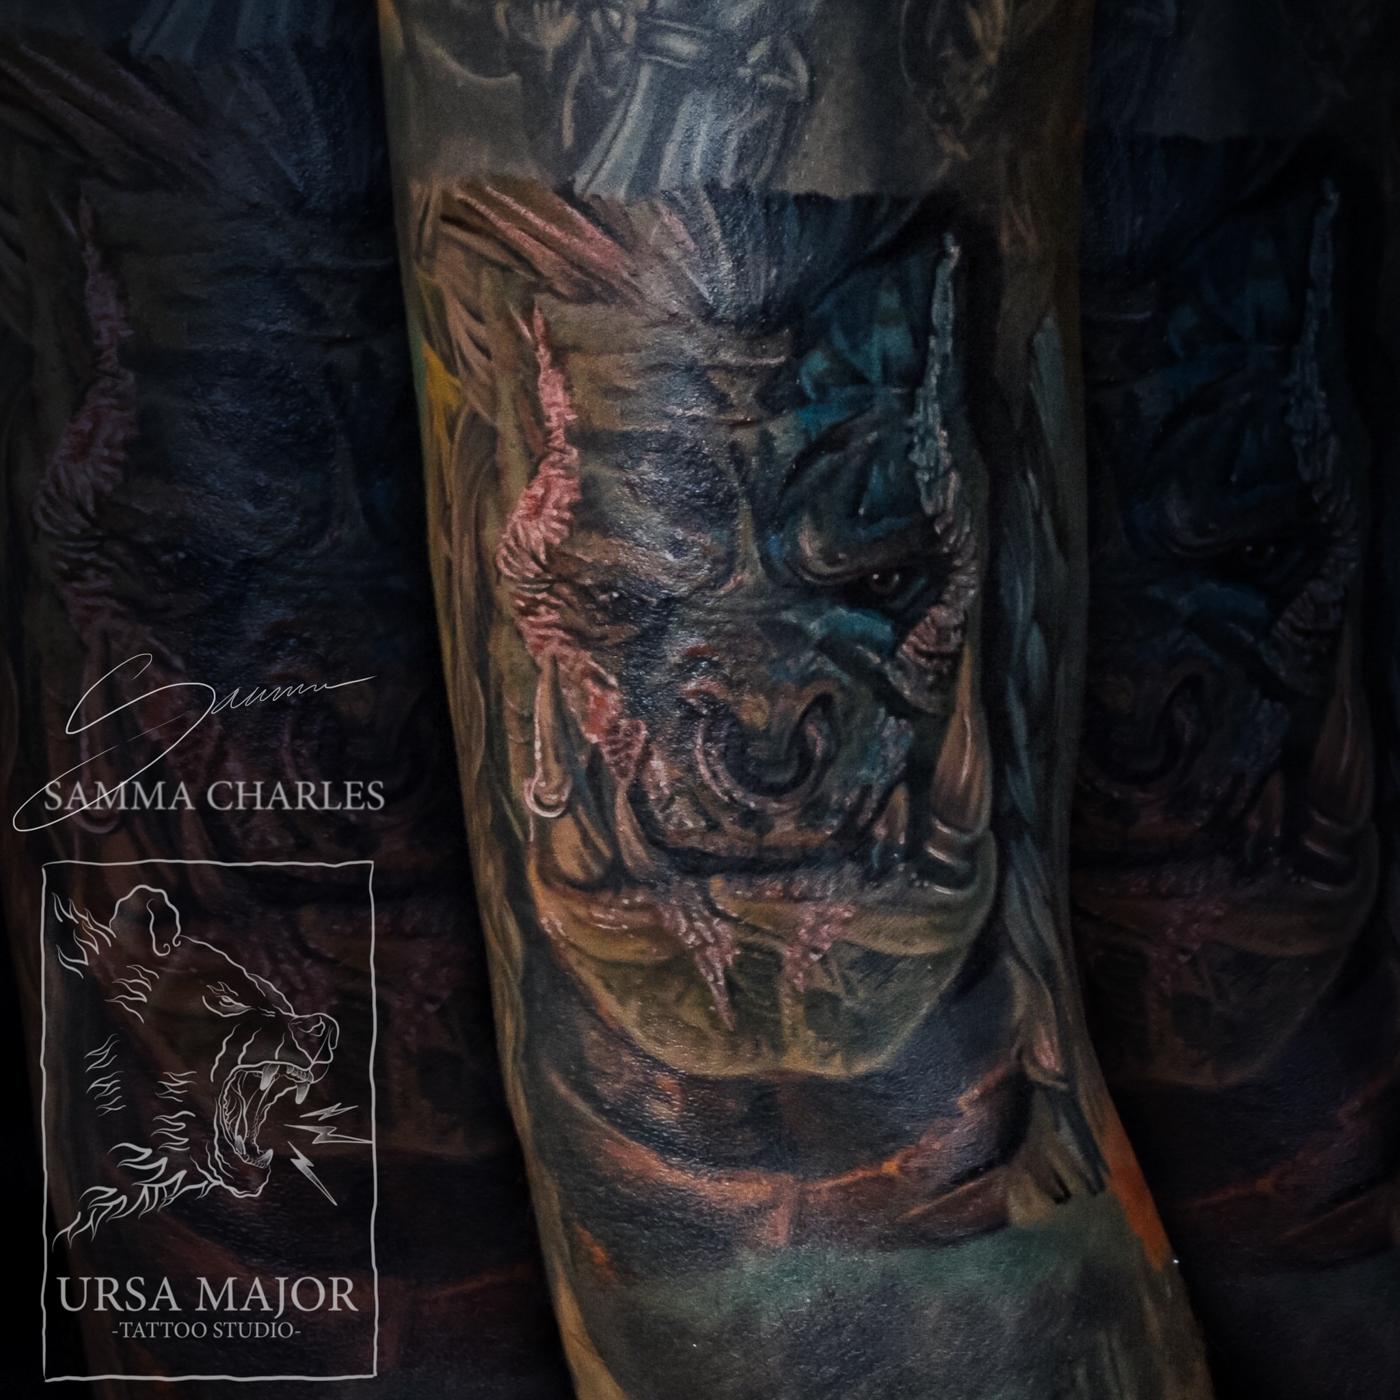 oxfordshire-tattoo-studio-40.jpg